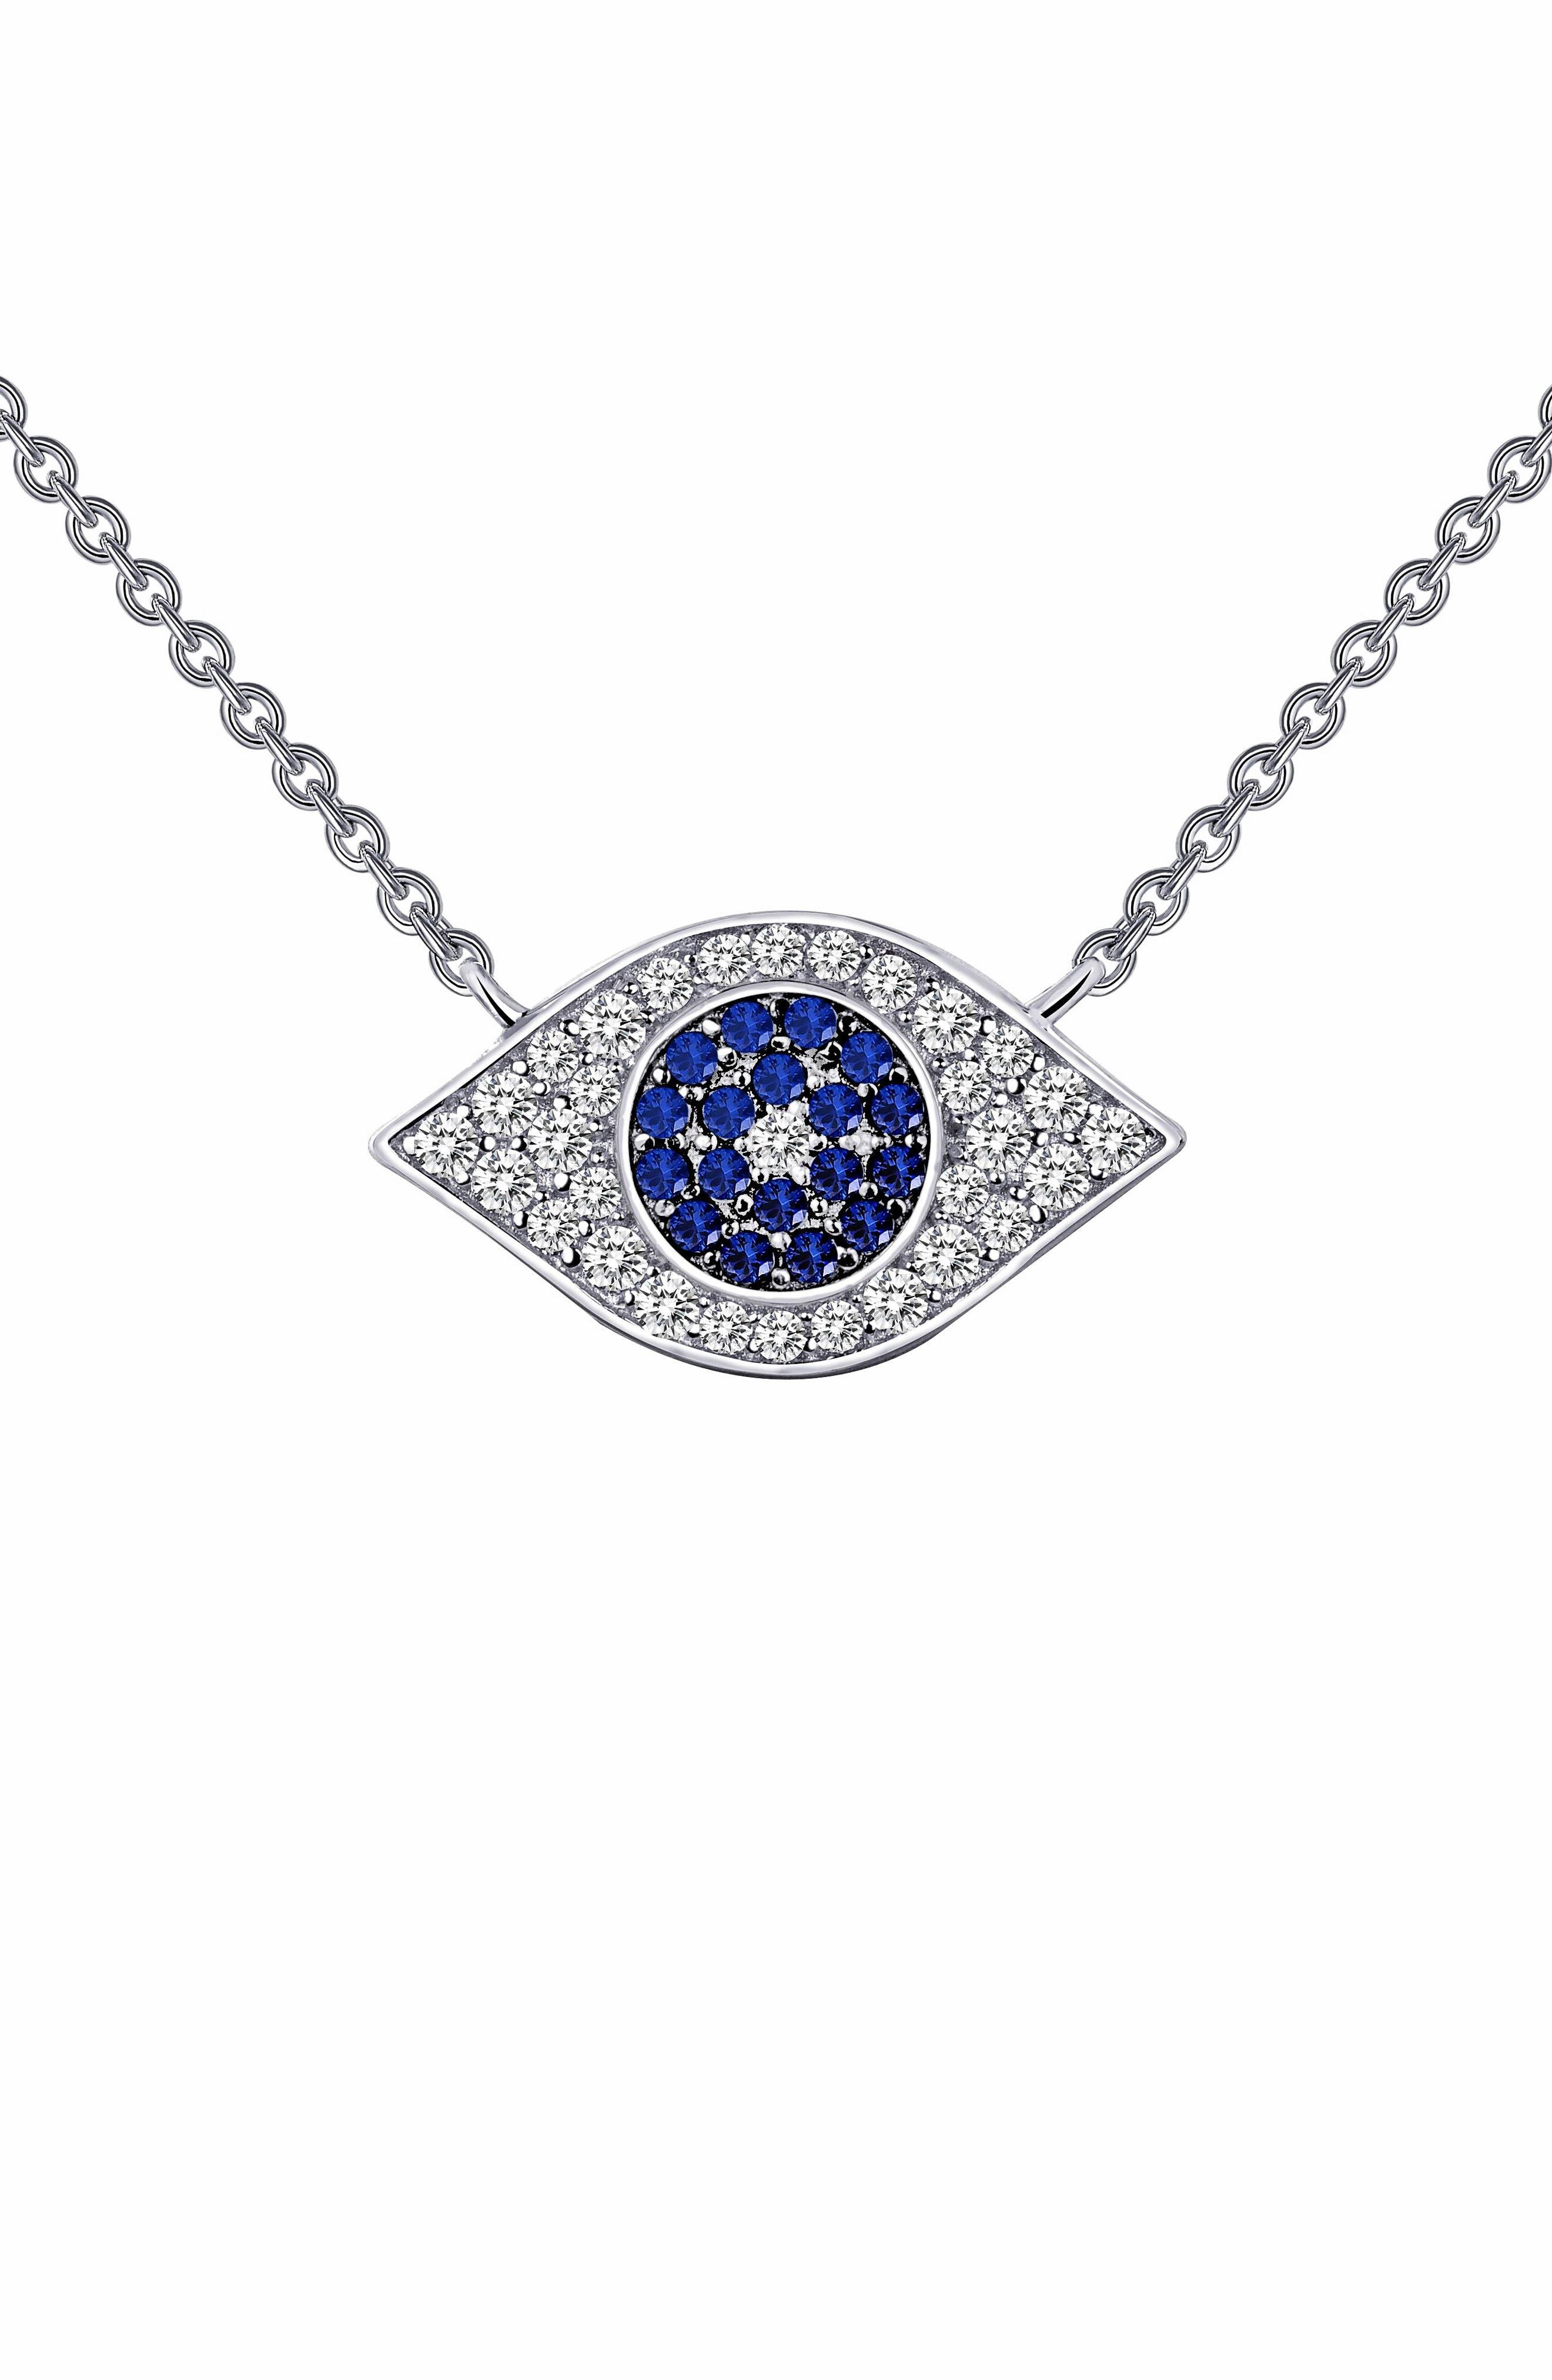 Lafonn Simulated Diamond Amulet Pendant Necklace